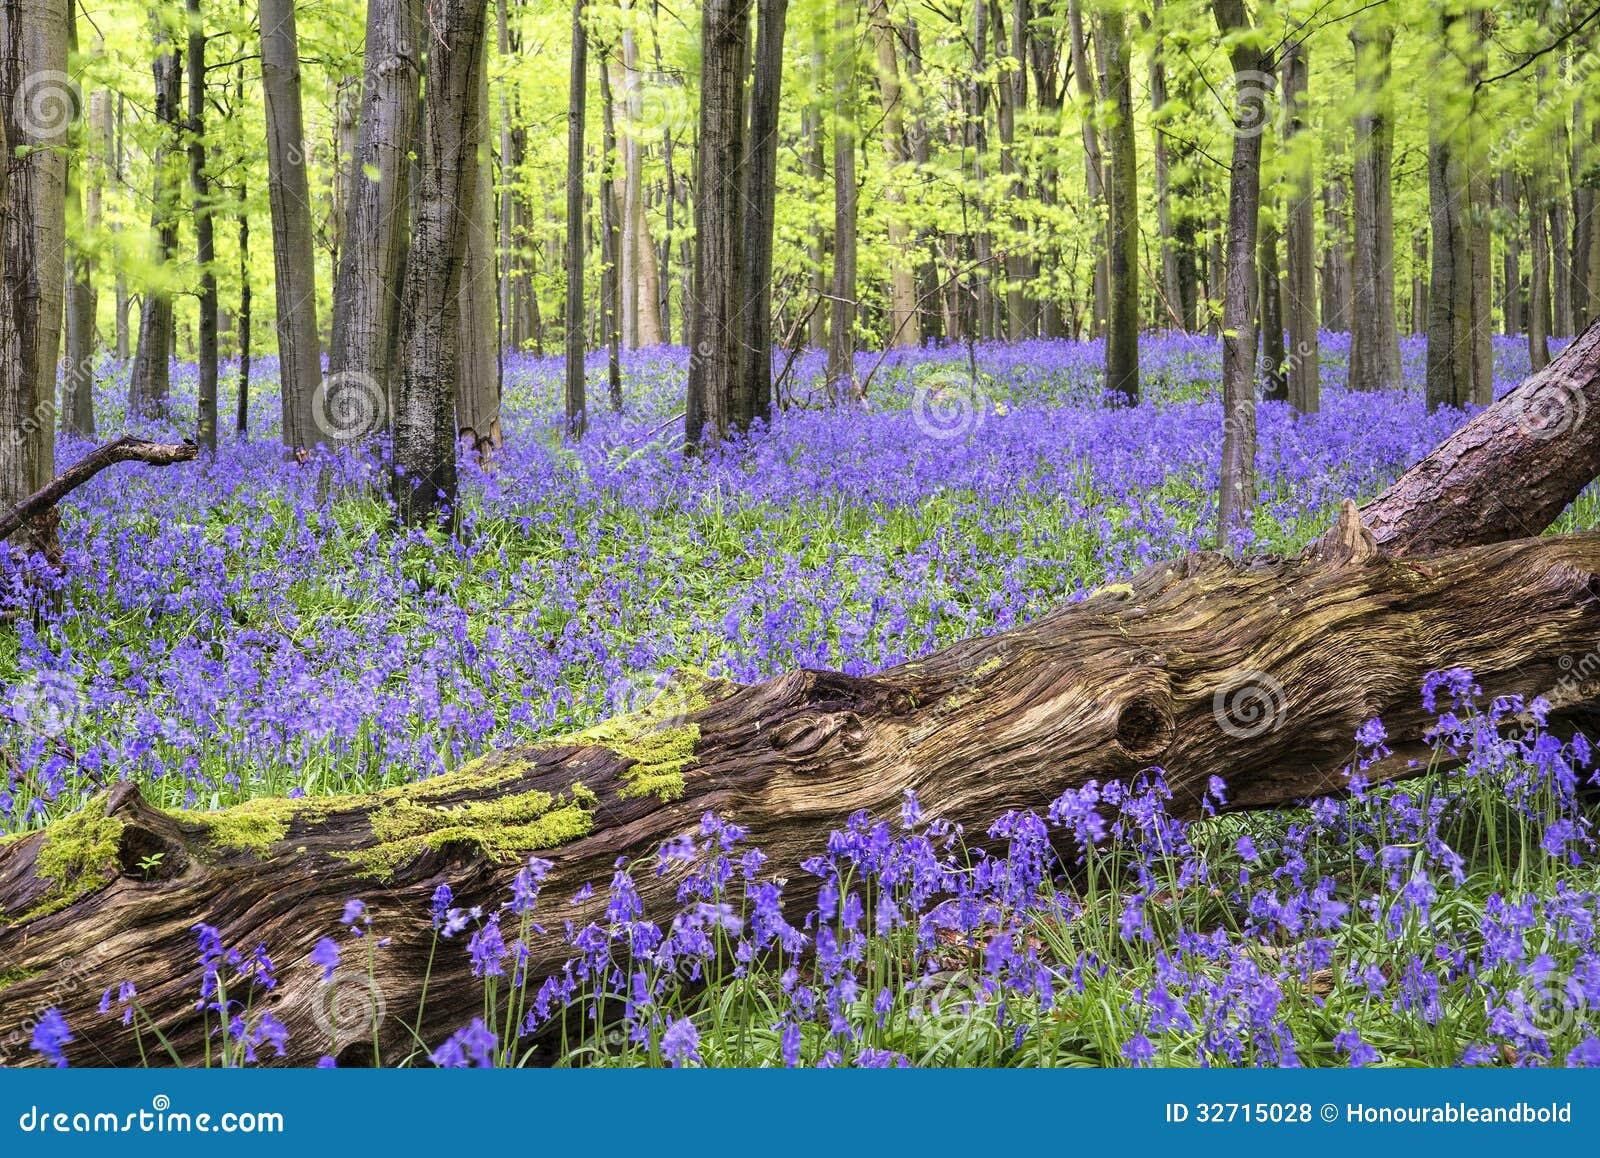 Vibrant Bluebell Carpet Spring Forest Landscape Royalty